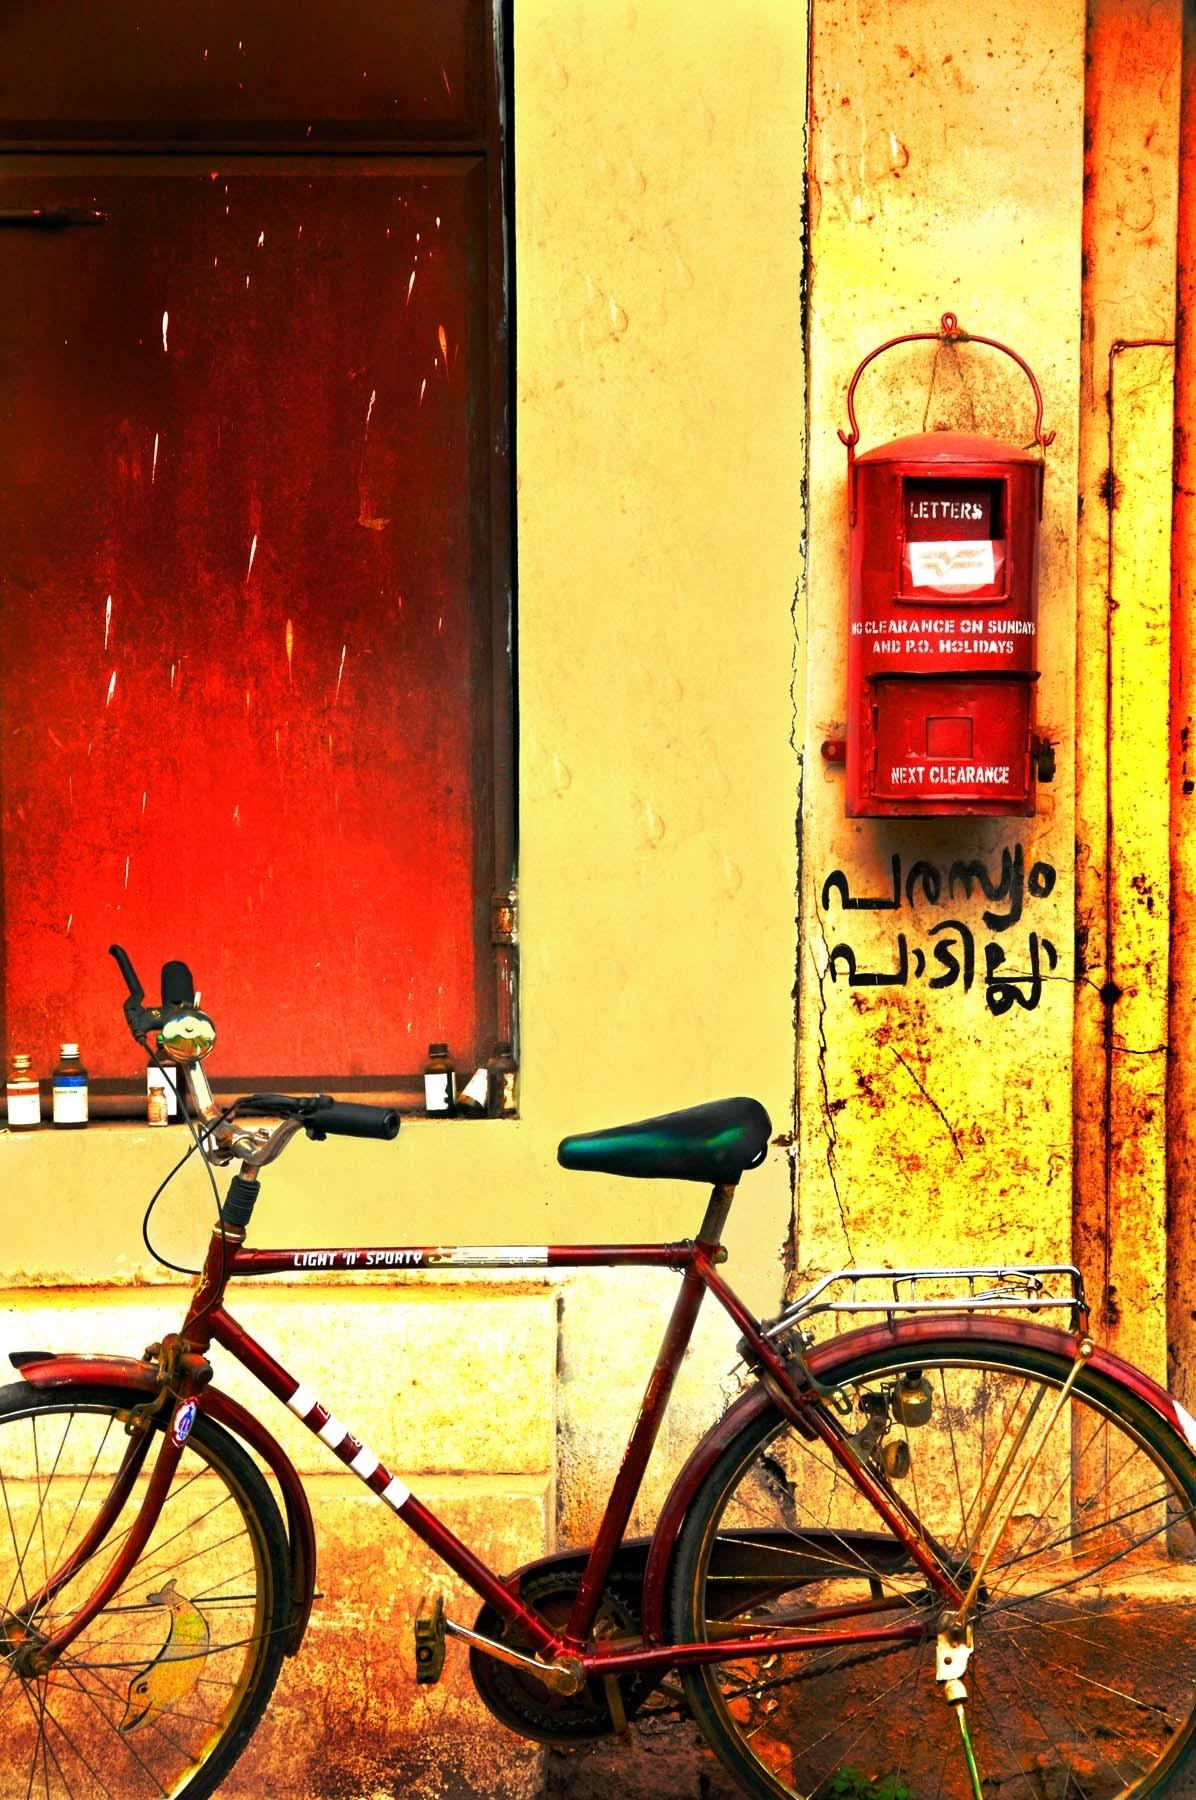 Untitled by Karan Khanna, Digital Photograph, Digital Print on Archival Paper, Brown color